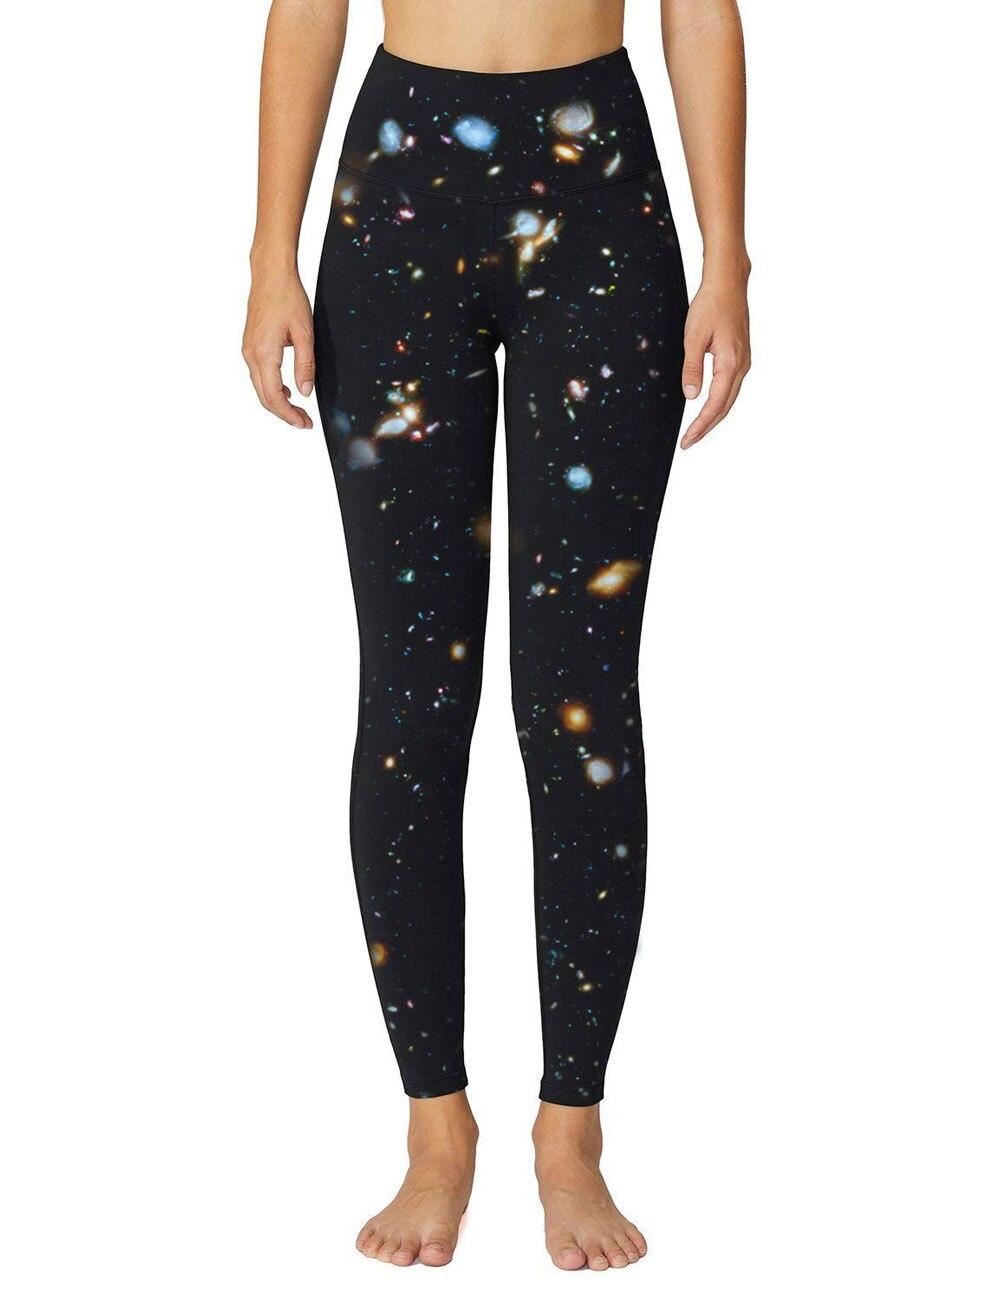 High Quality Universe Galaxies Women's Digital Printed Yoga Capris High Waist Workout Pants Moisture Wicking Running Leggings 6